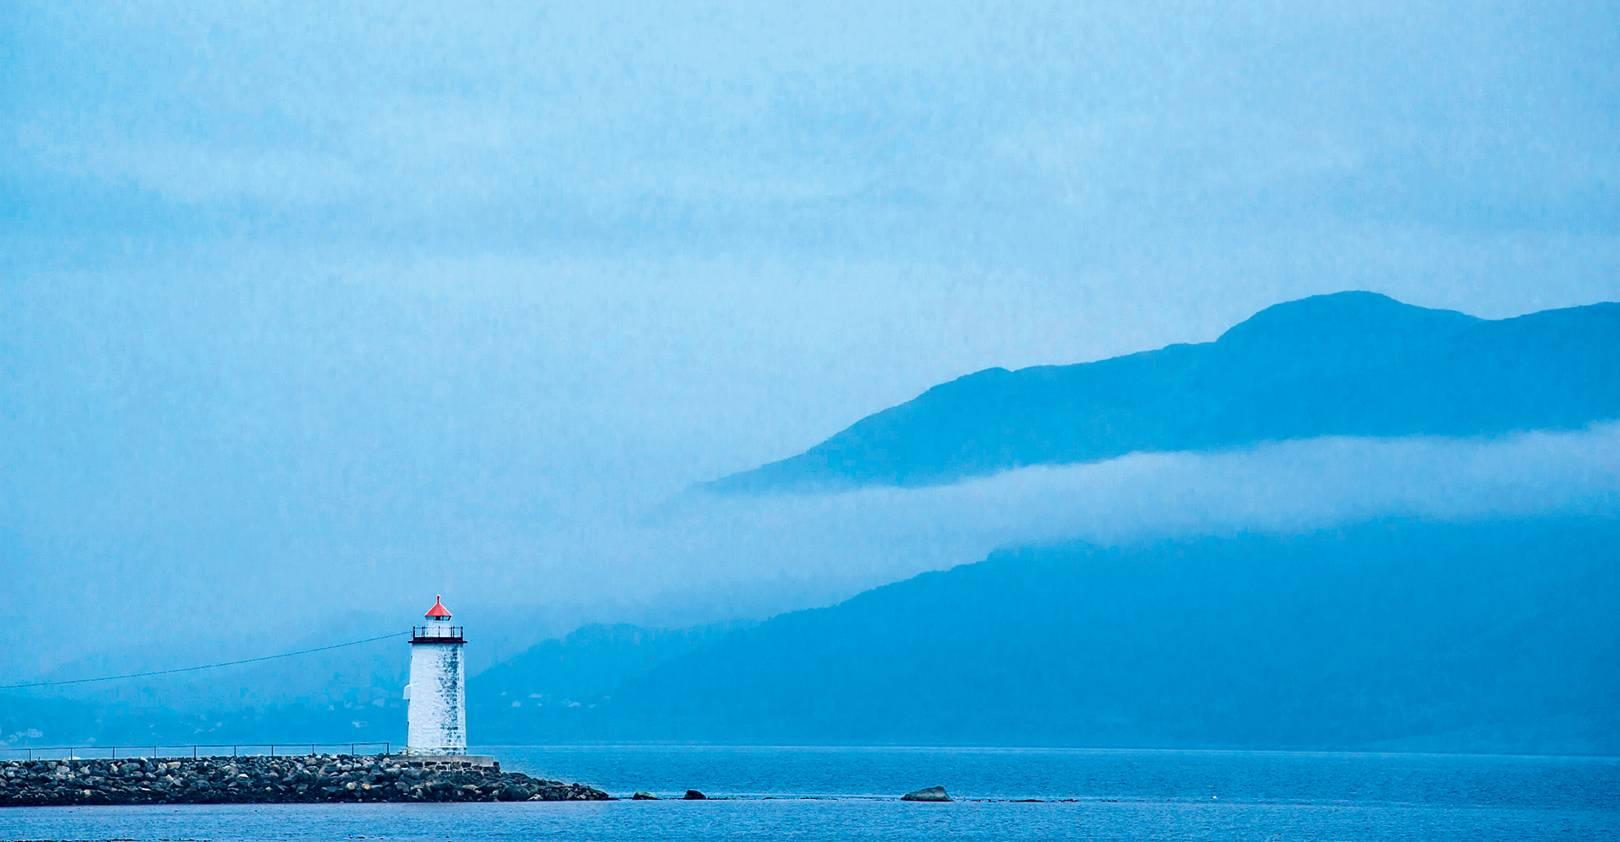 Norway Fjords: Road trip along Scandinavia's most dramatic coastline